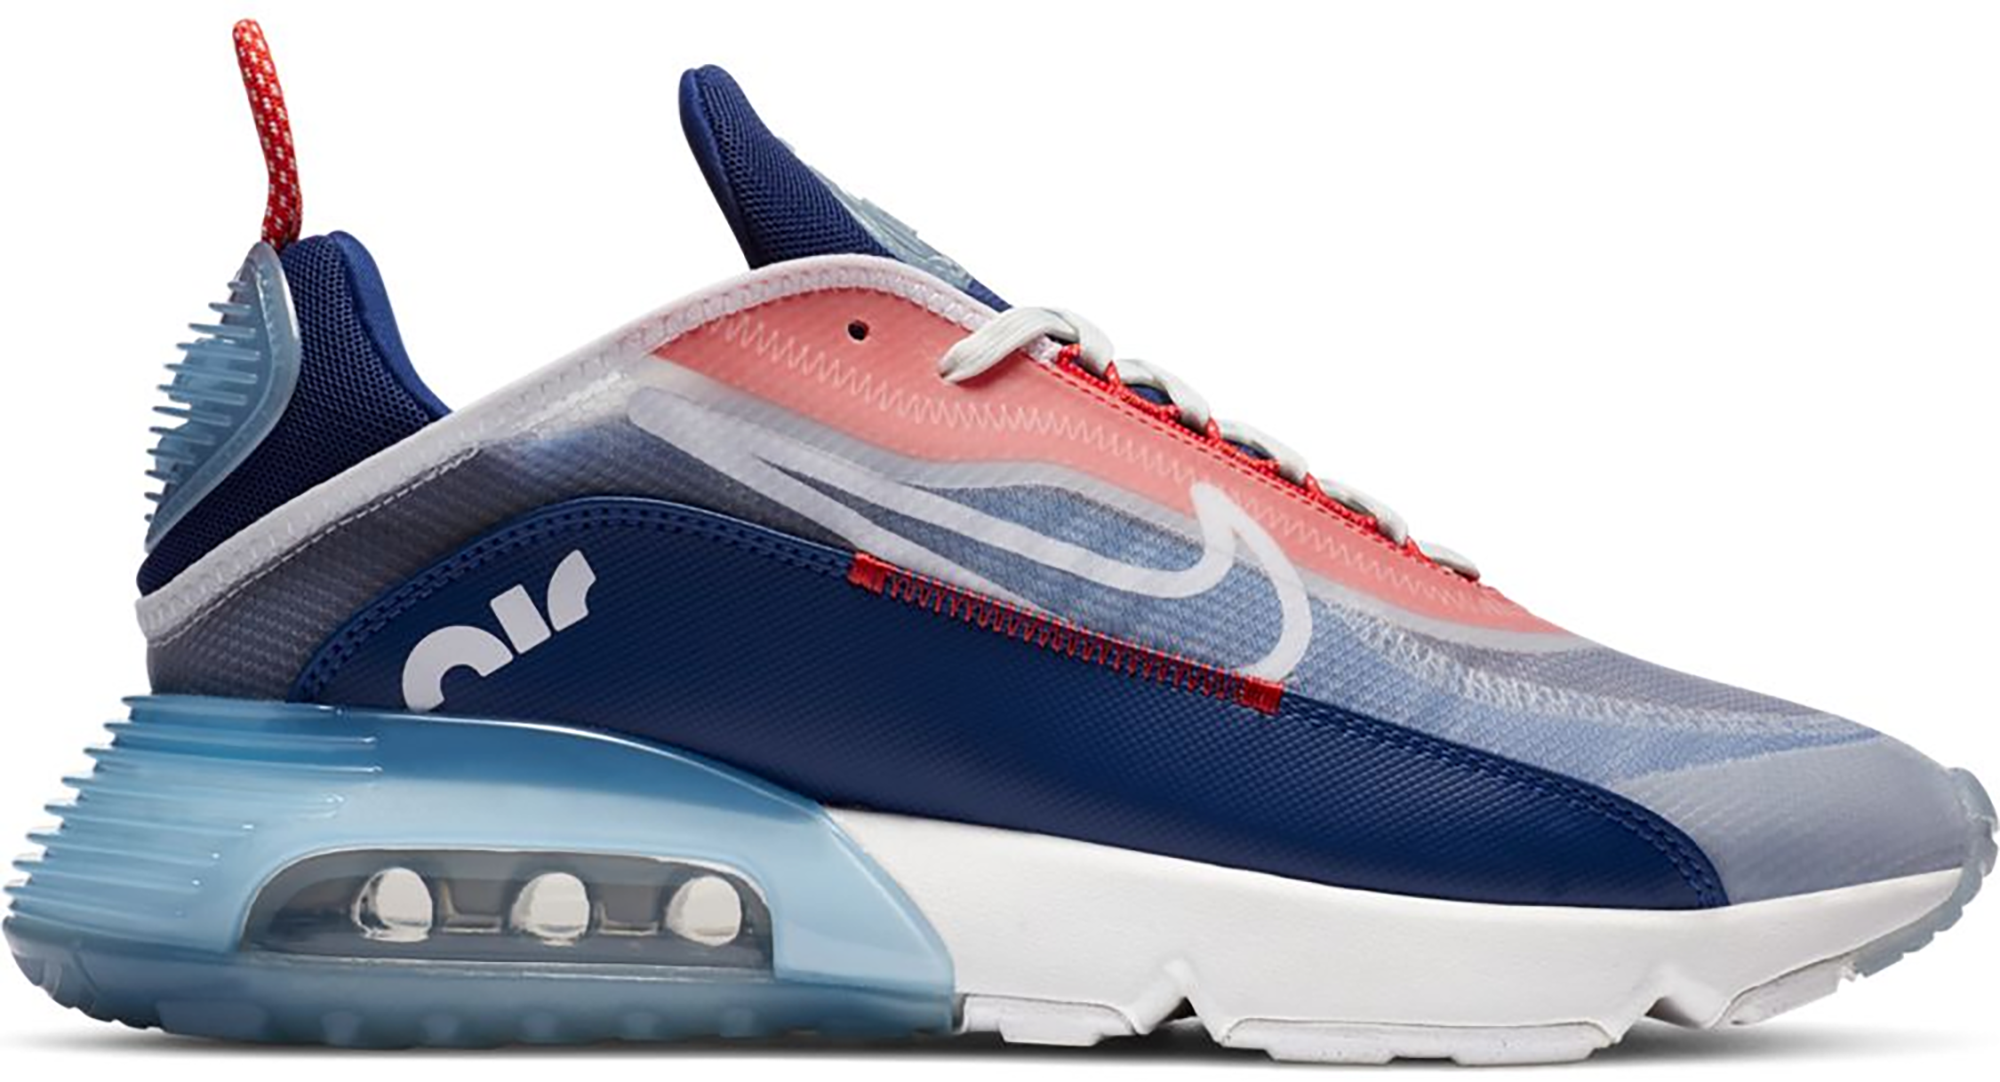 Nike Air Max 2090 USA - CT1091-101